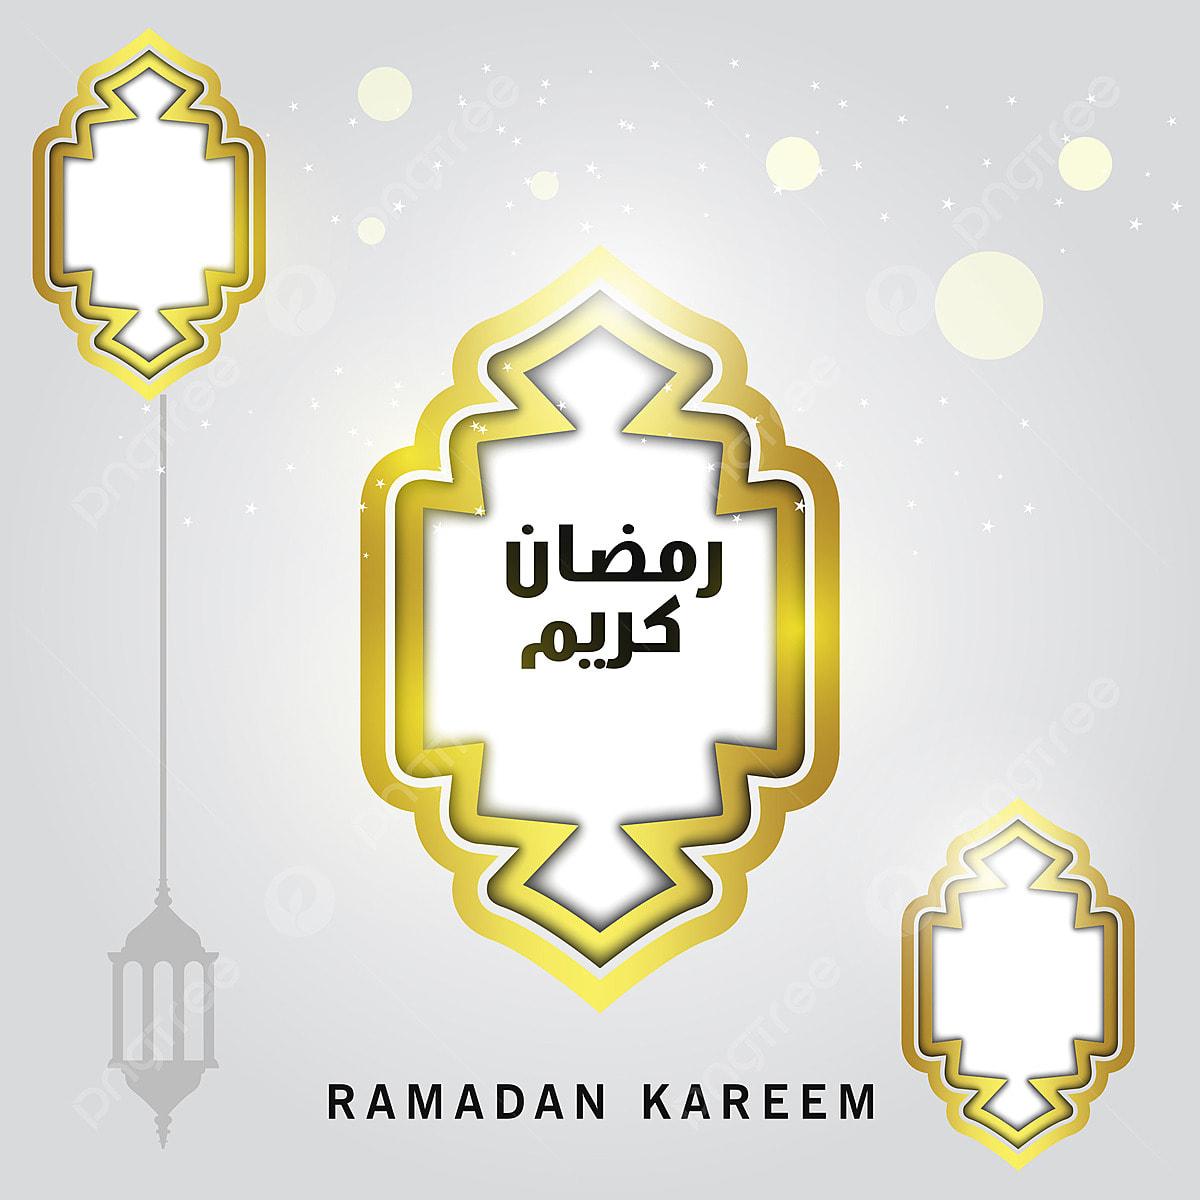 ramadan kareem mubarak greeting with islamic shape ramadan ramadan kareem ramadan mubarak png and vector with transparent background for free download https pngtree com freepng ramadan kareem mubarak greeting with islamic shape 5342267 html